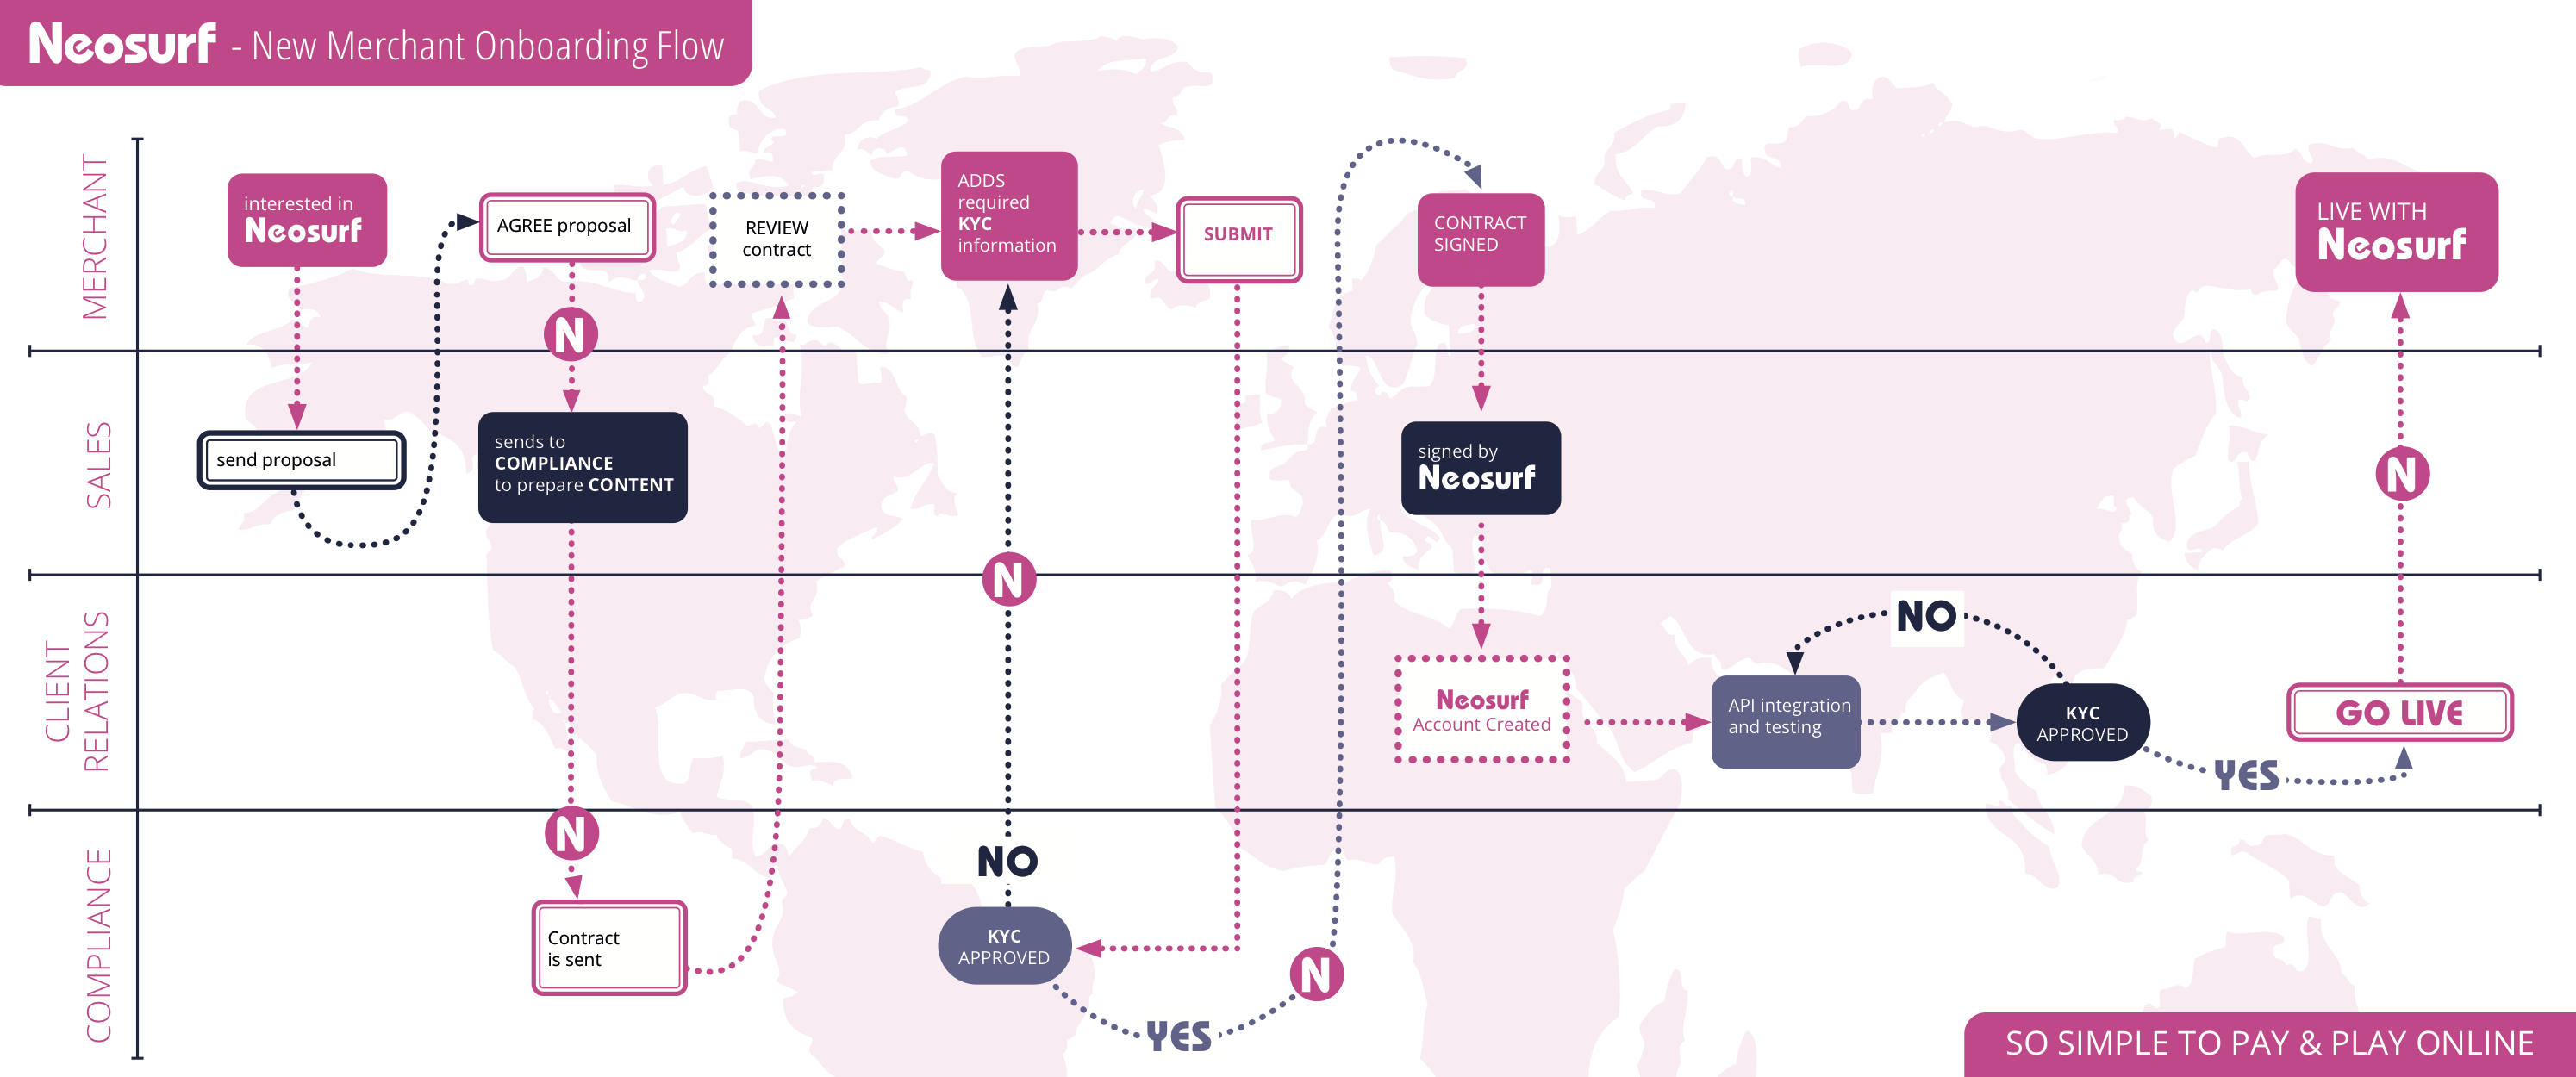 Neosurf New Merchant Onboarding Flow Chart